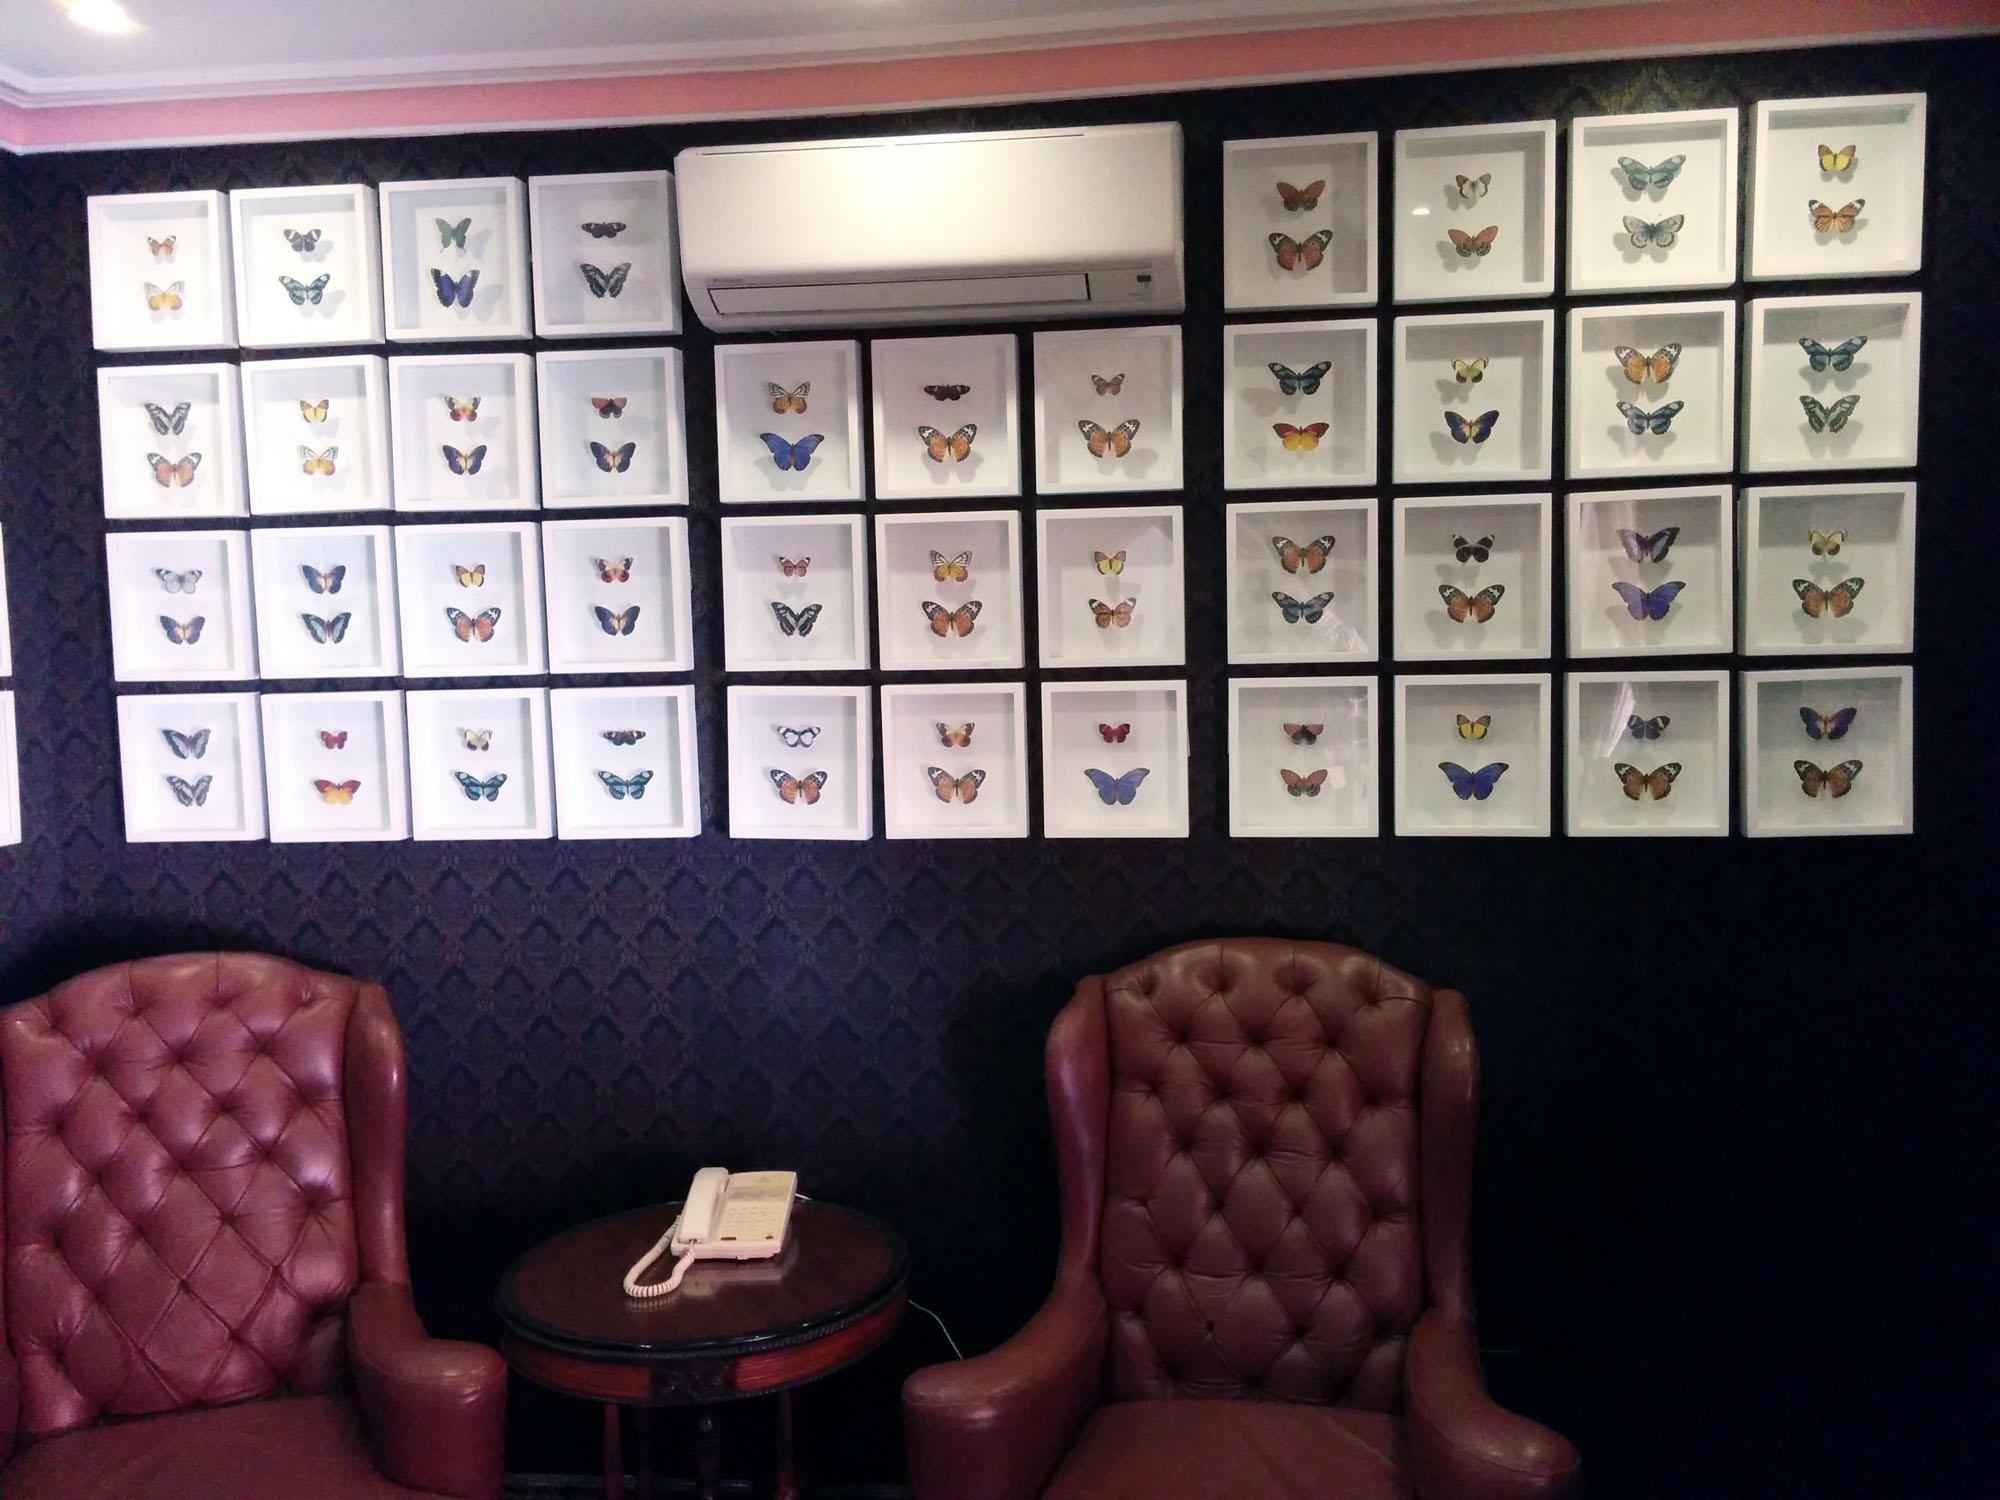 Mayfair Lagoon - Butterfly lounge